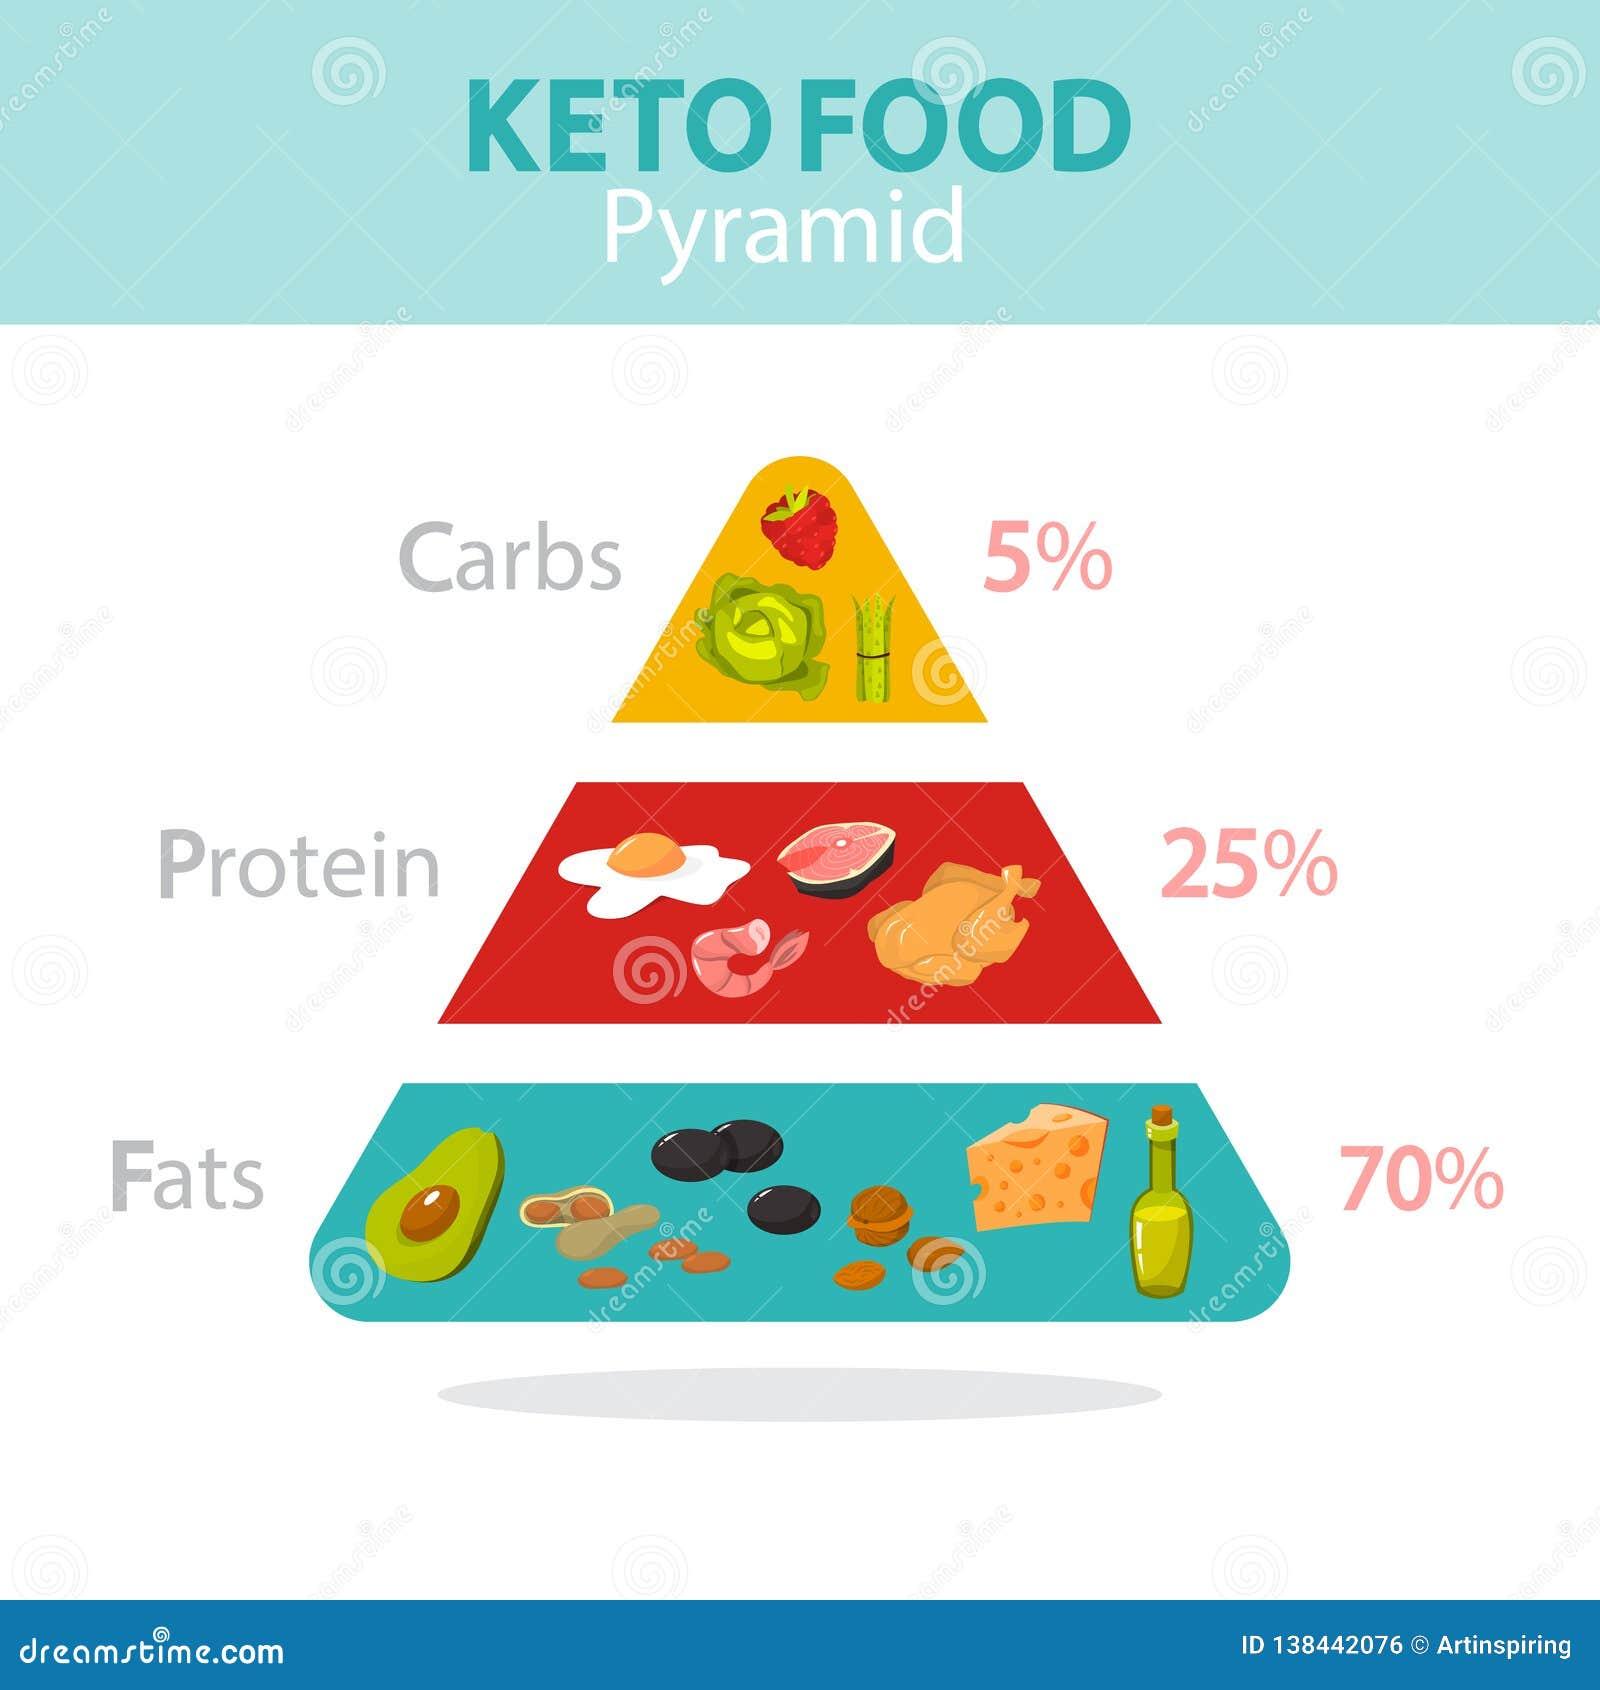 plan de comida ceto alto en grasa